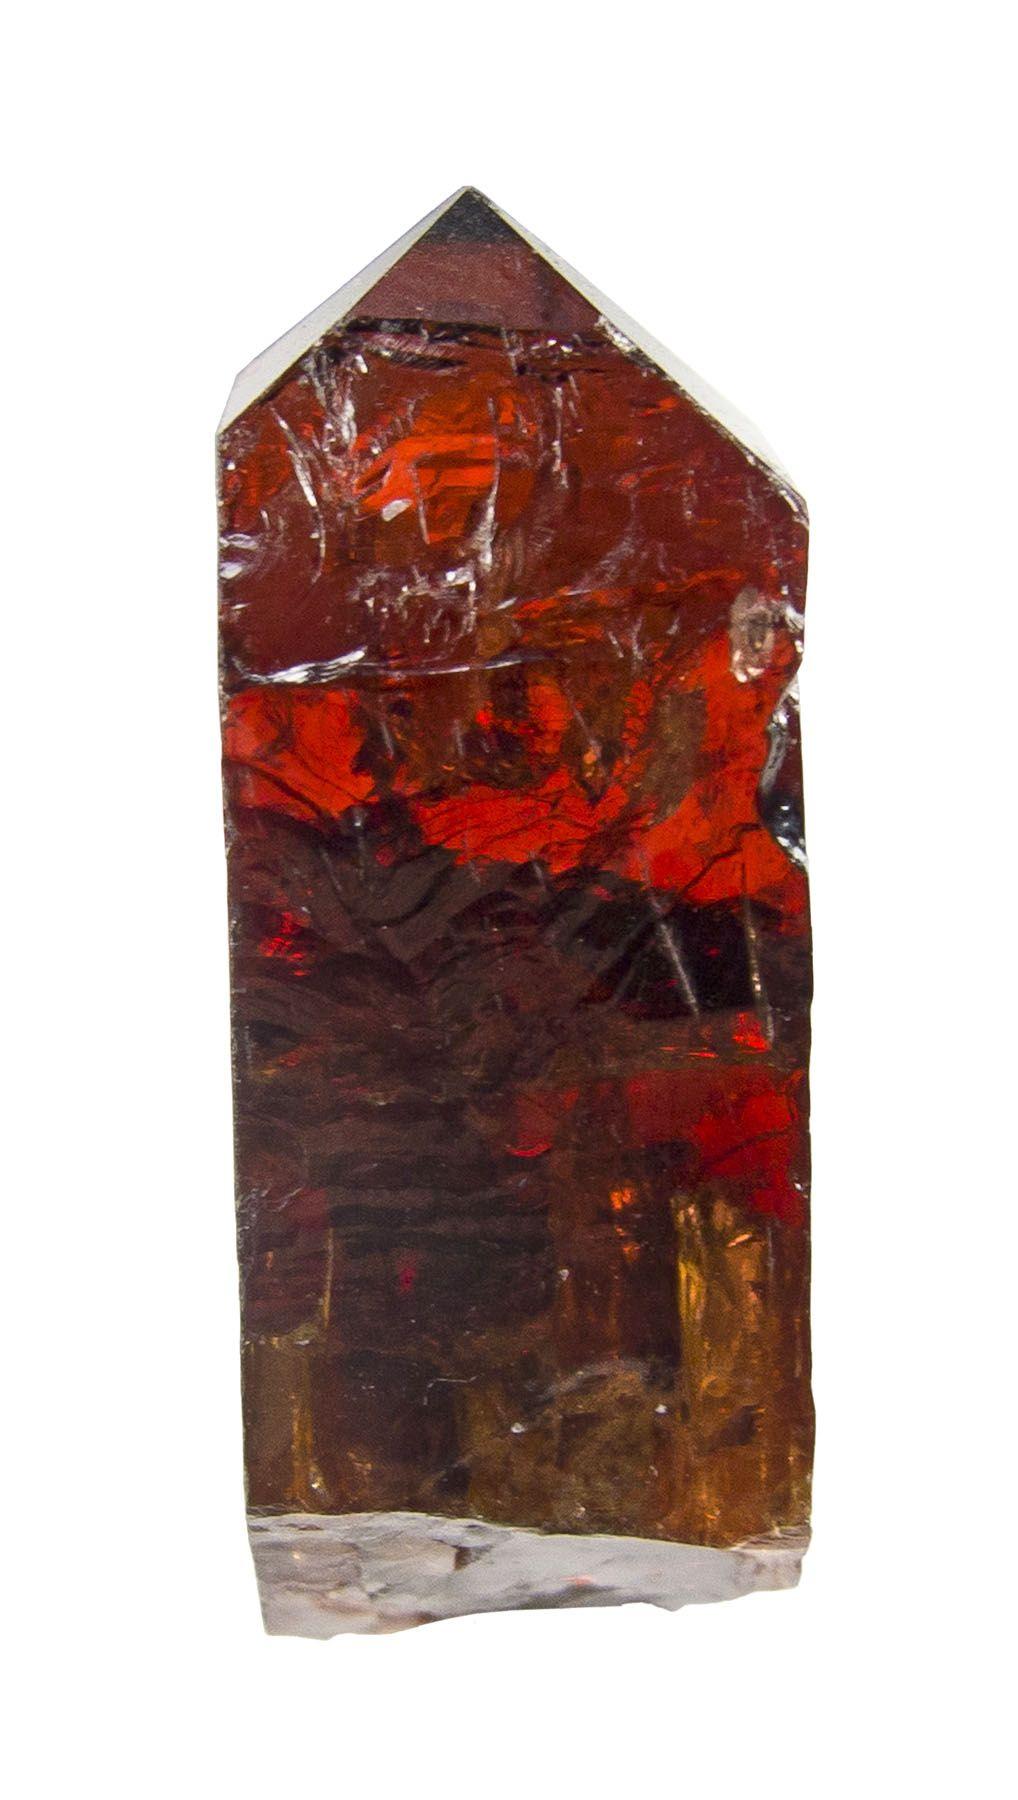 21904f3d959d Zircon Jacinth Amber Zircon-Gad s stone- 11th foundational stone in new  jerusalem. rev.21 20